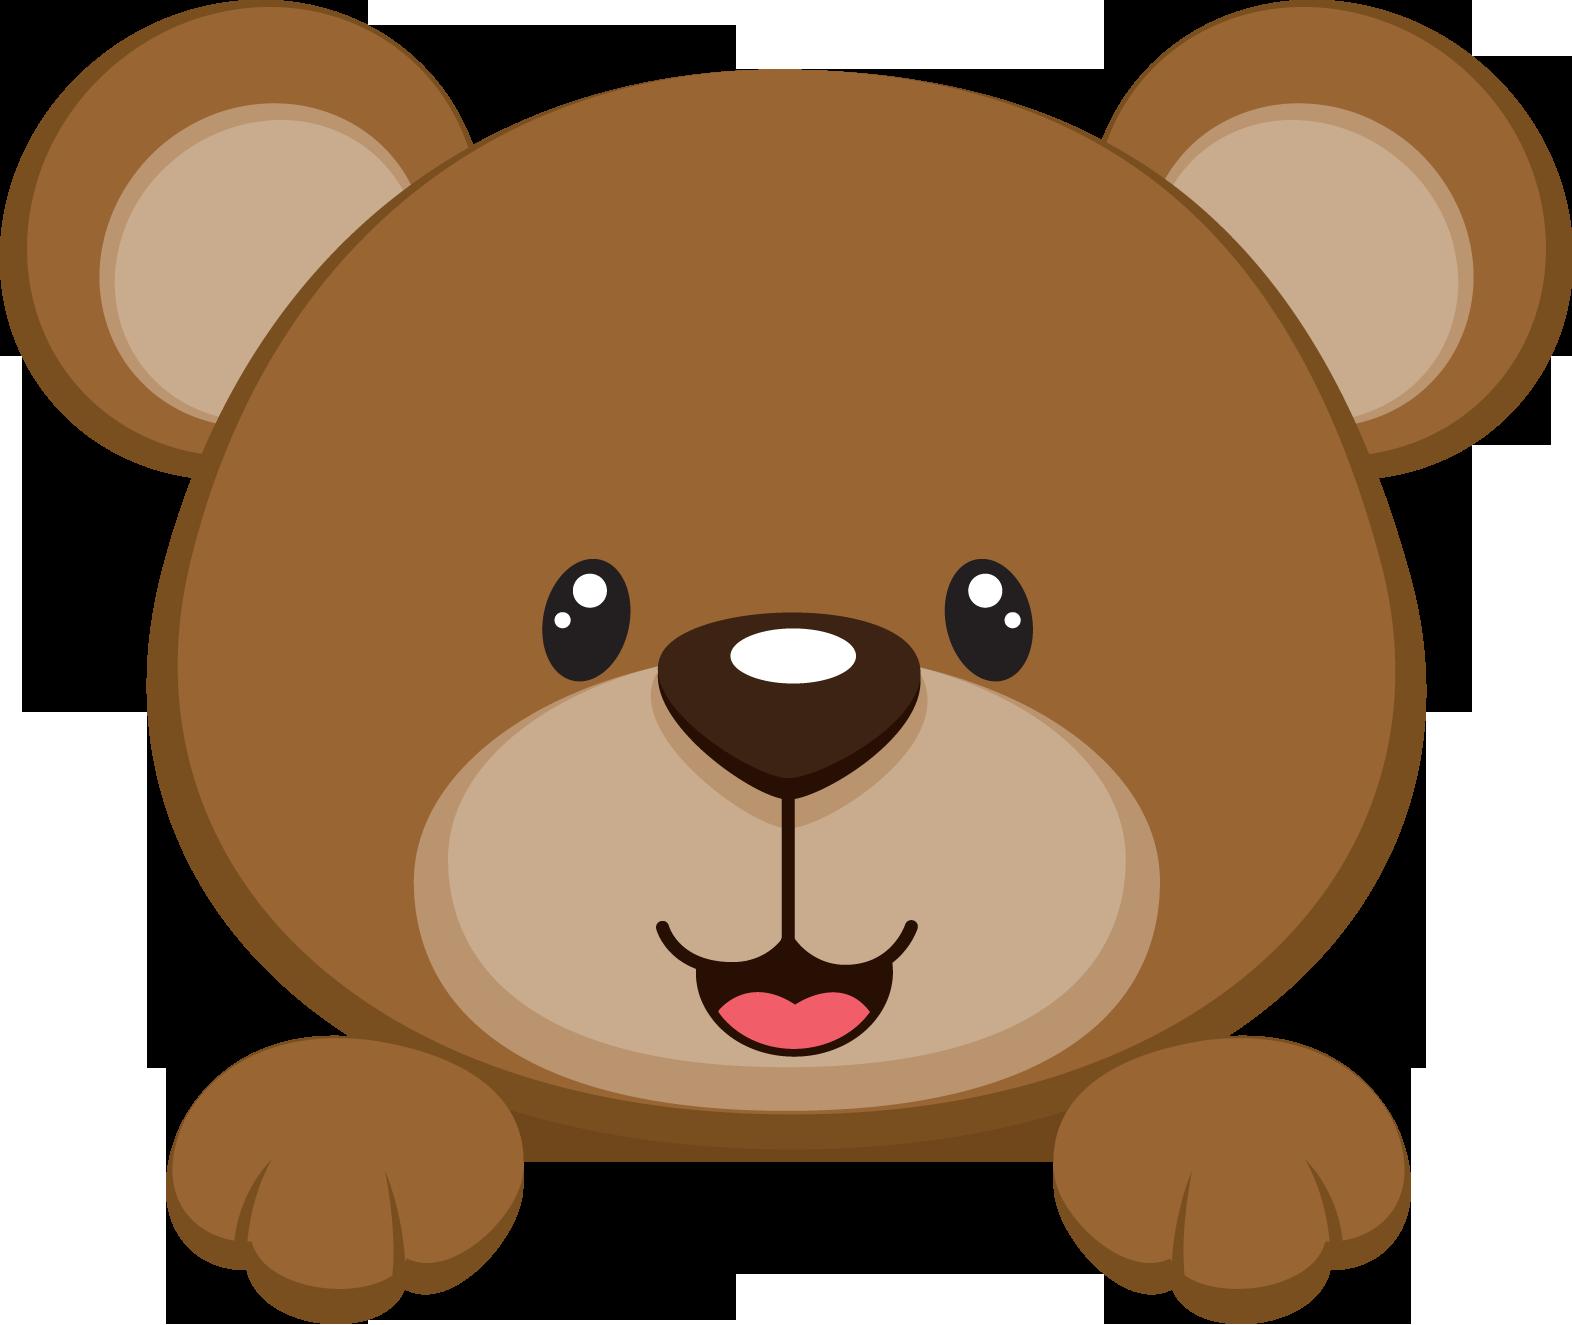 pin by verna otzoy on teddy bears pinterest babies bears and